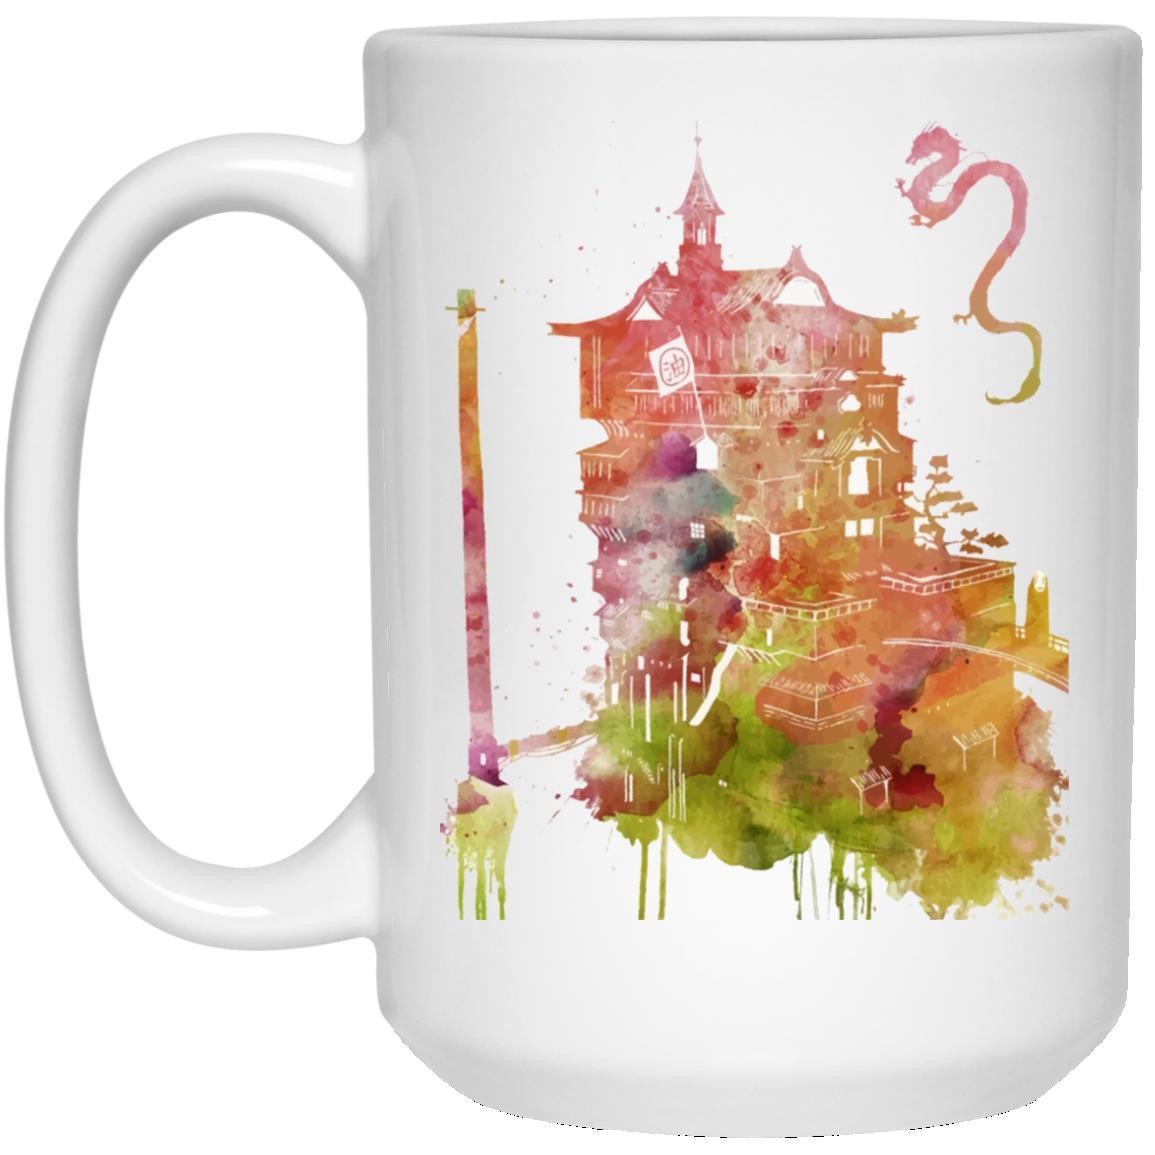 Spirited Away – The Bathhouse Color Cutout Mug